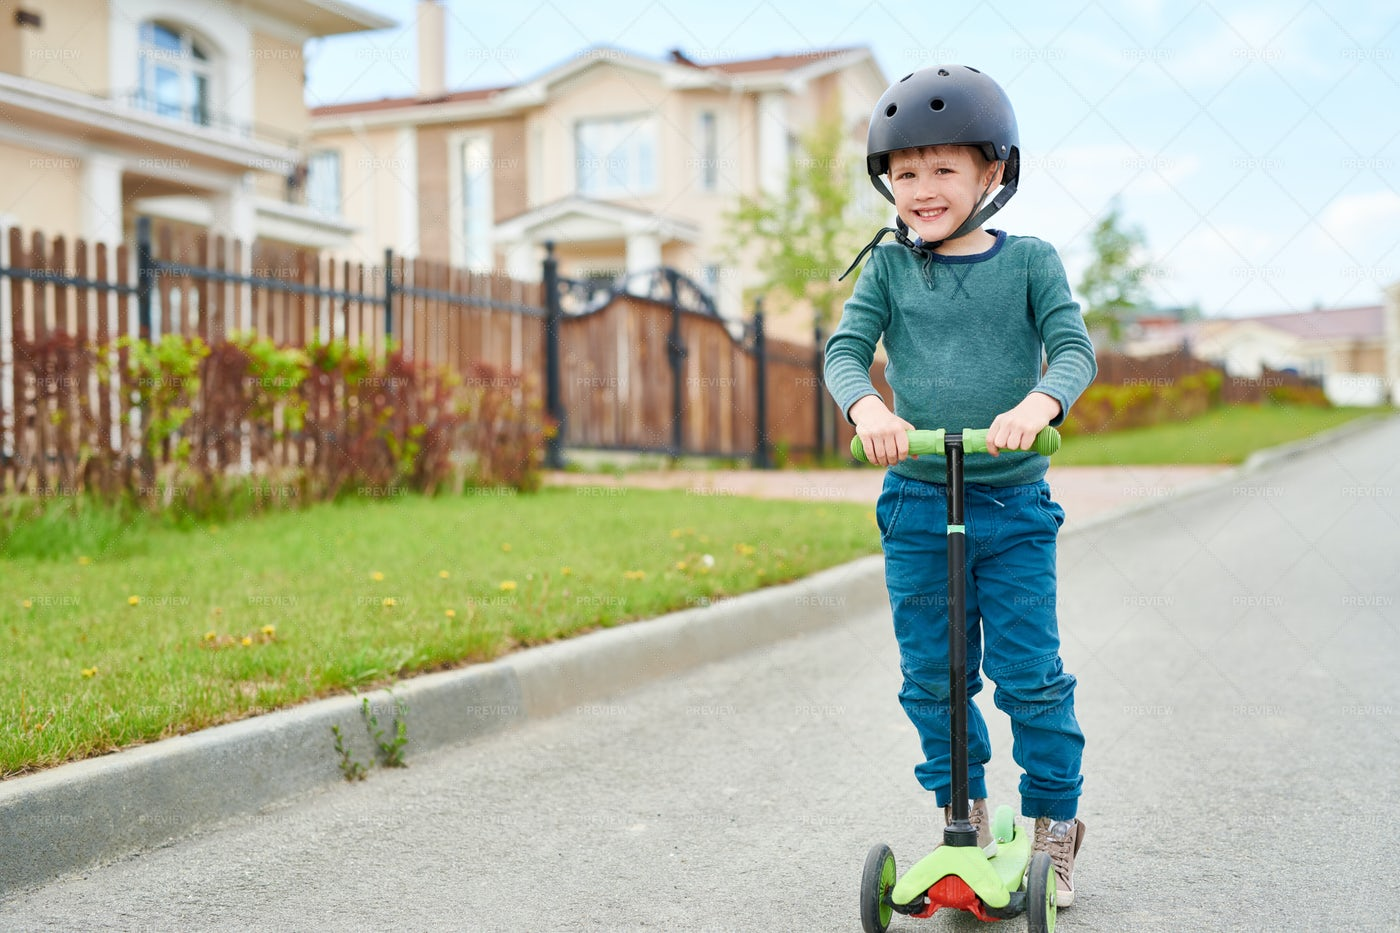 Smiling Boy  Riding Scooter: Stock Photos